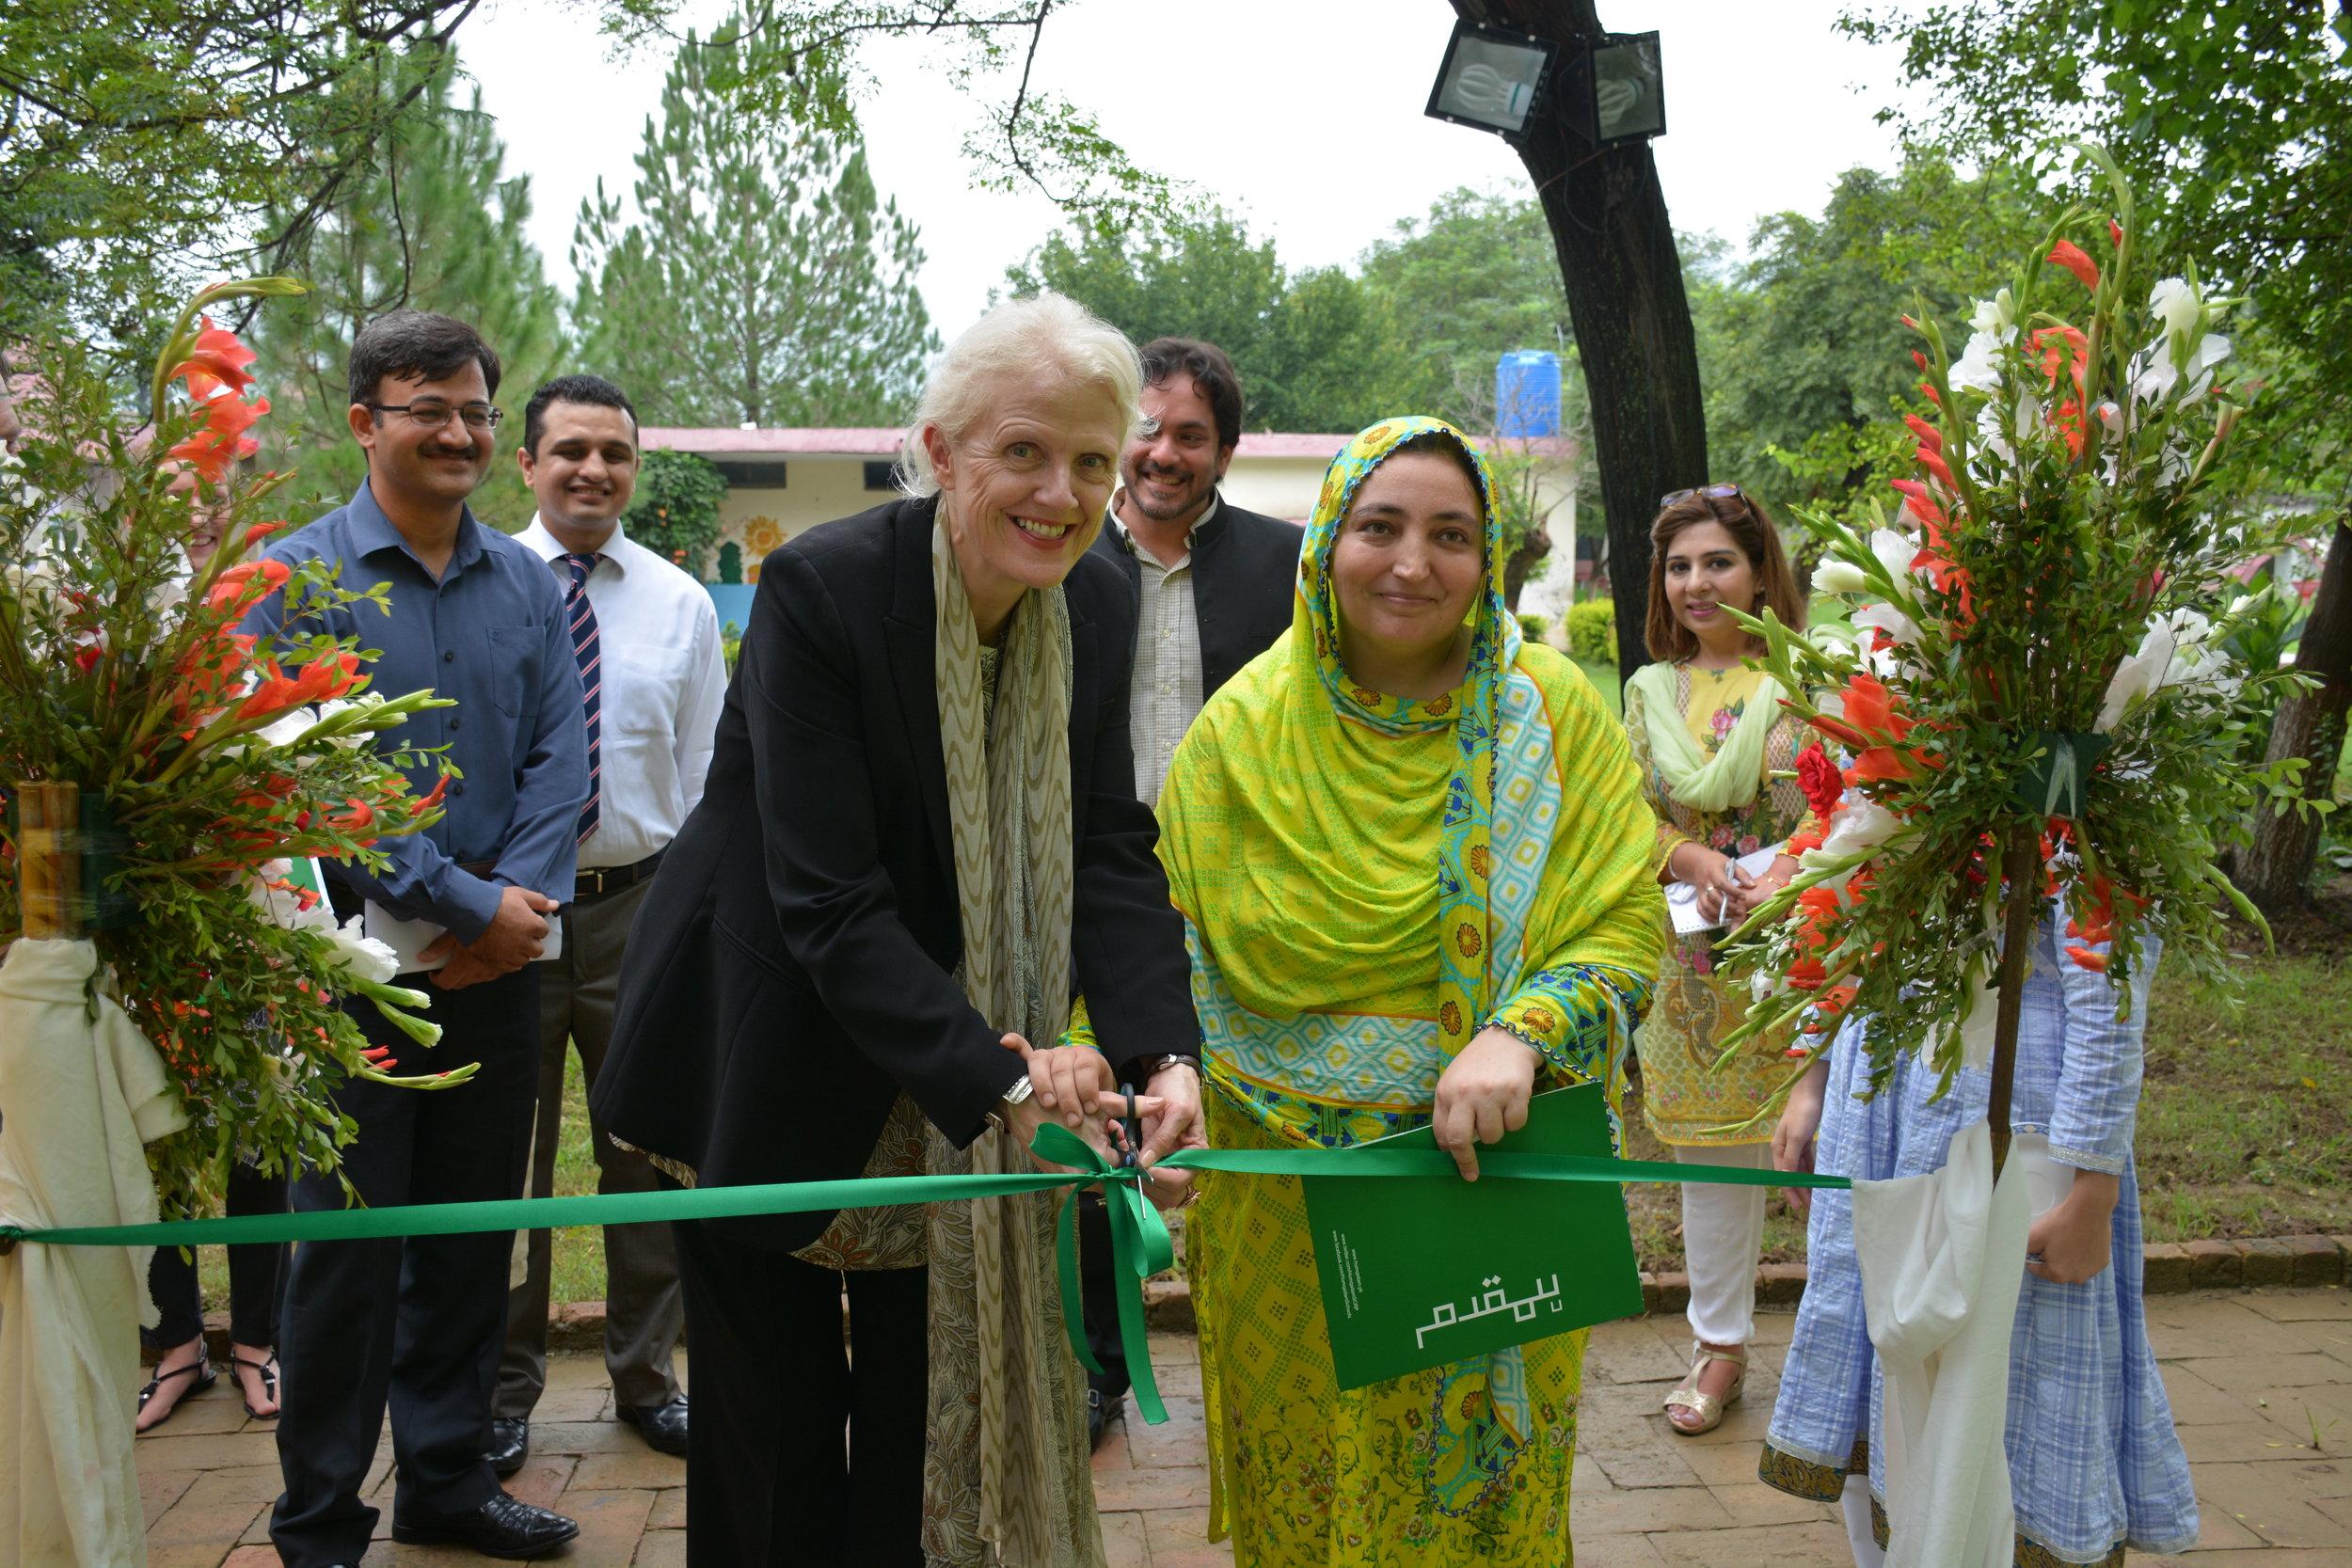 Pakistan Deputy Head Judith Herbertson and school's principal Sajida Bibi cut the ribbon at the library inauguration ceremony in Islamabad on 31 July 2017. Credit: Syed Abdullah Hameed/Humqadam.